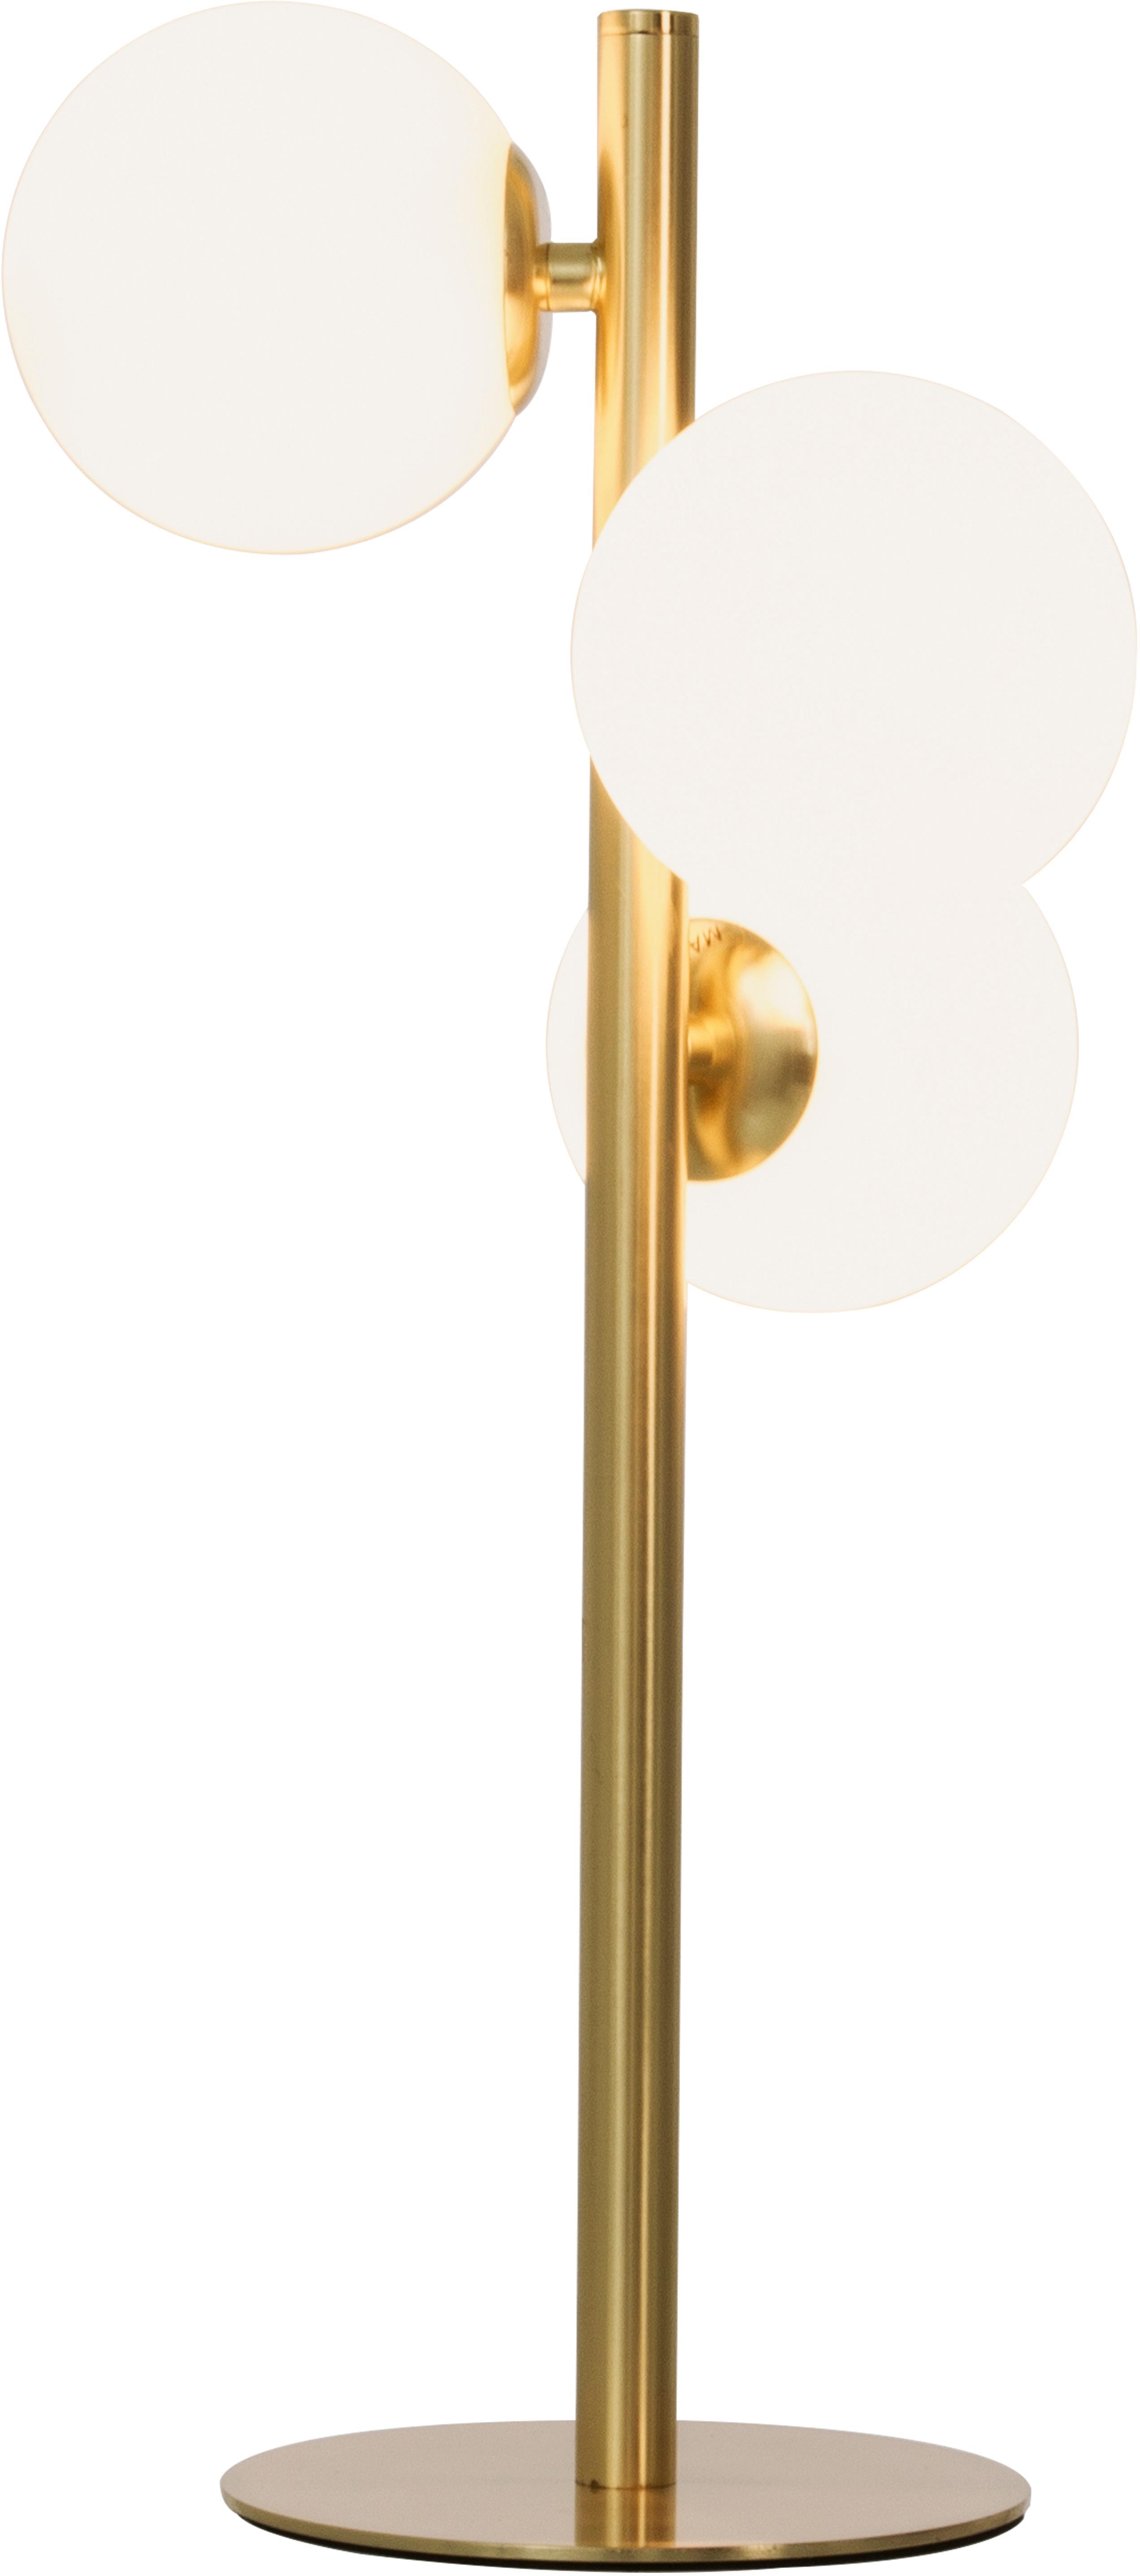 Tafellamp Molekyl, Lampenkap: opaalglas, Lampvoet: messing, Messingkleurig, opaalwit, 24 x 46 cm